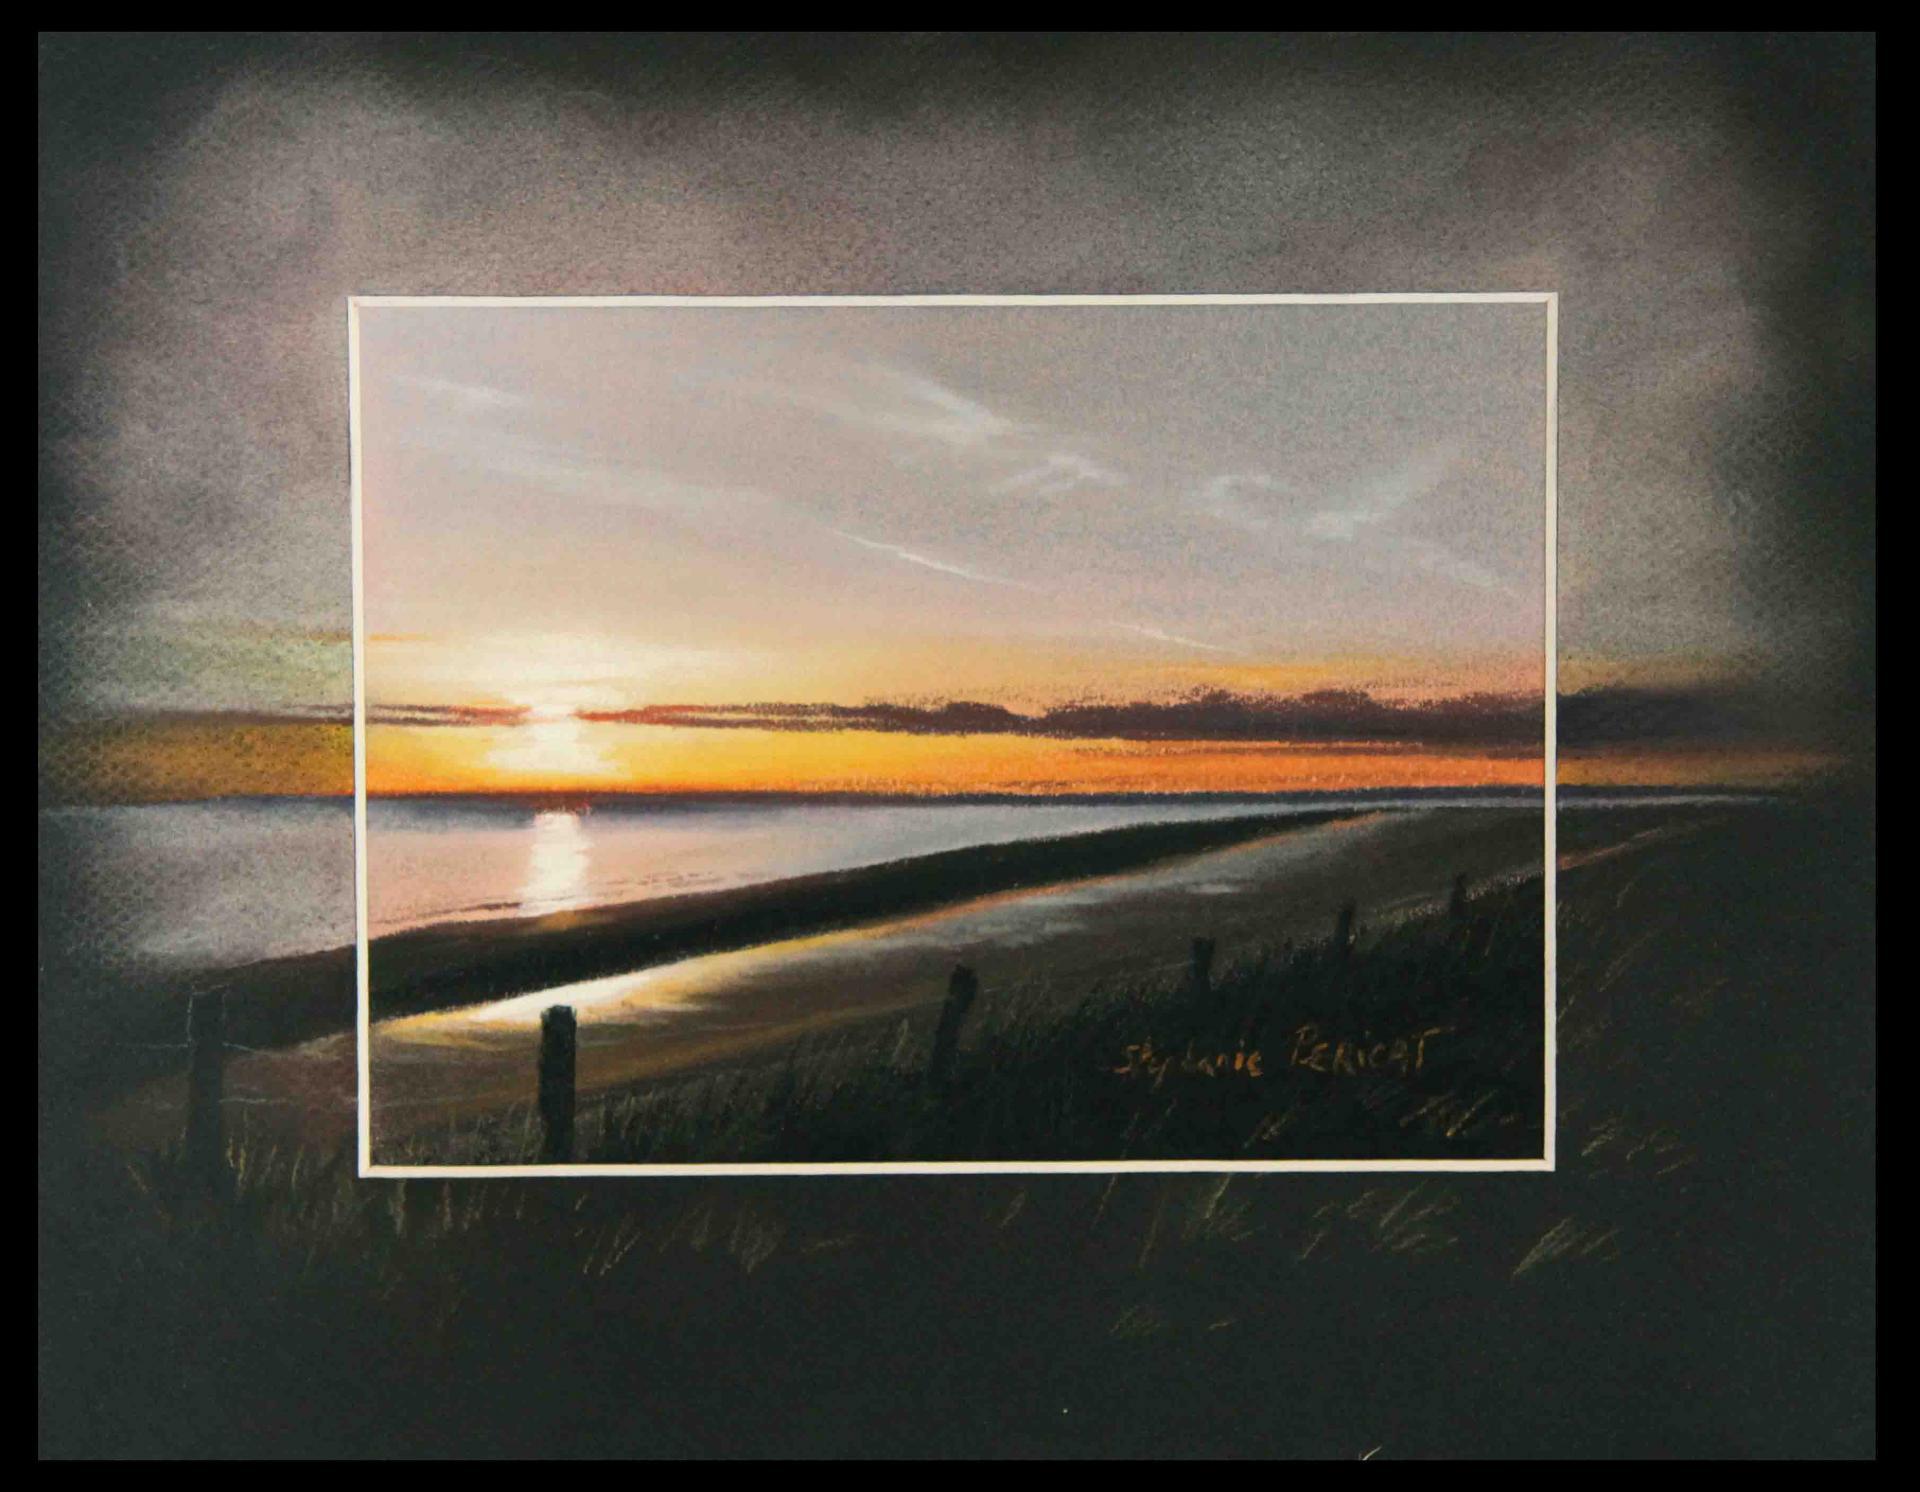 SOLEIL LEVANT A UTAH BEACH (living sun at utah beach) - pastel sec (soft pastel) - 24x30cm